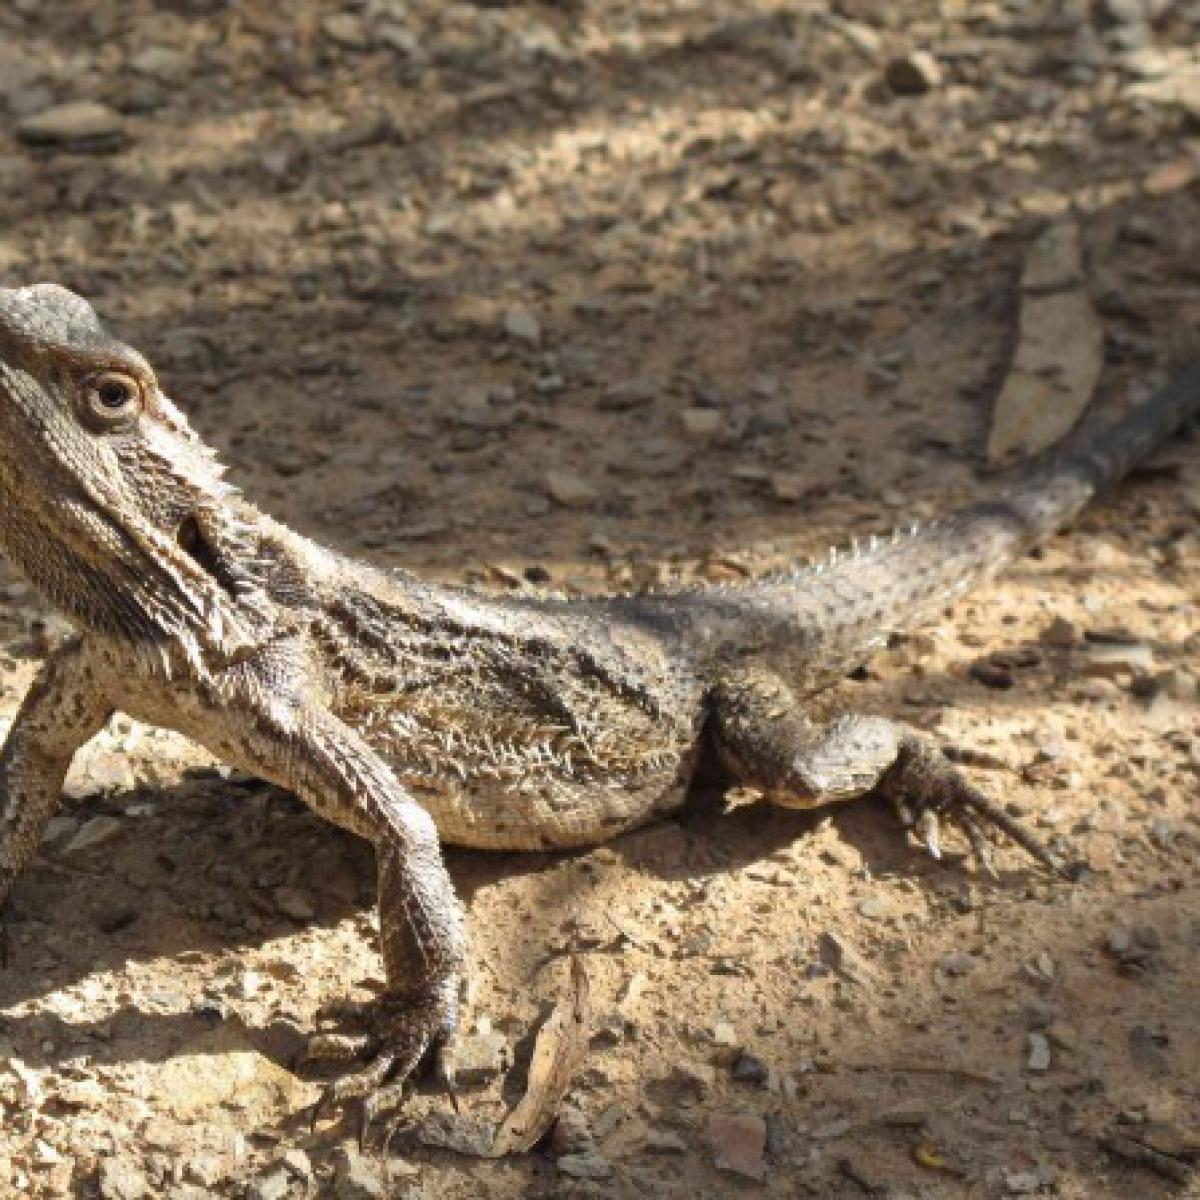 Common Bearded Dragon (Pogona barbata)